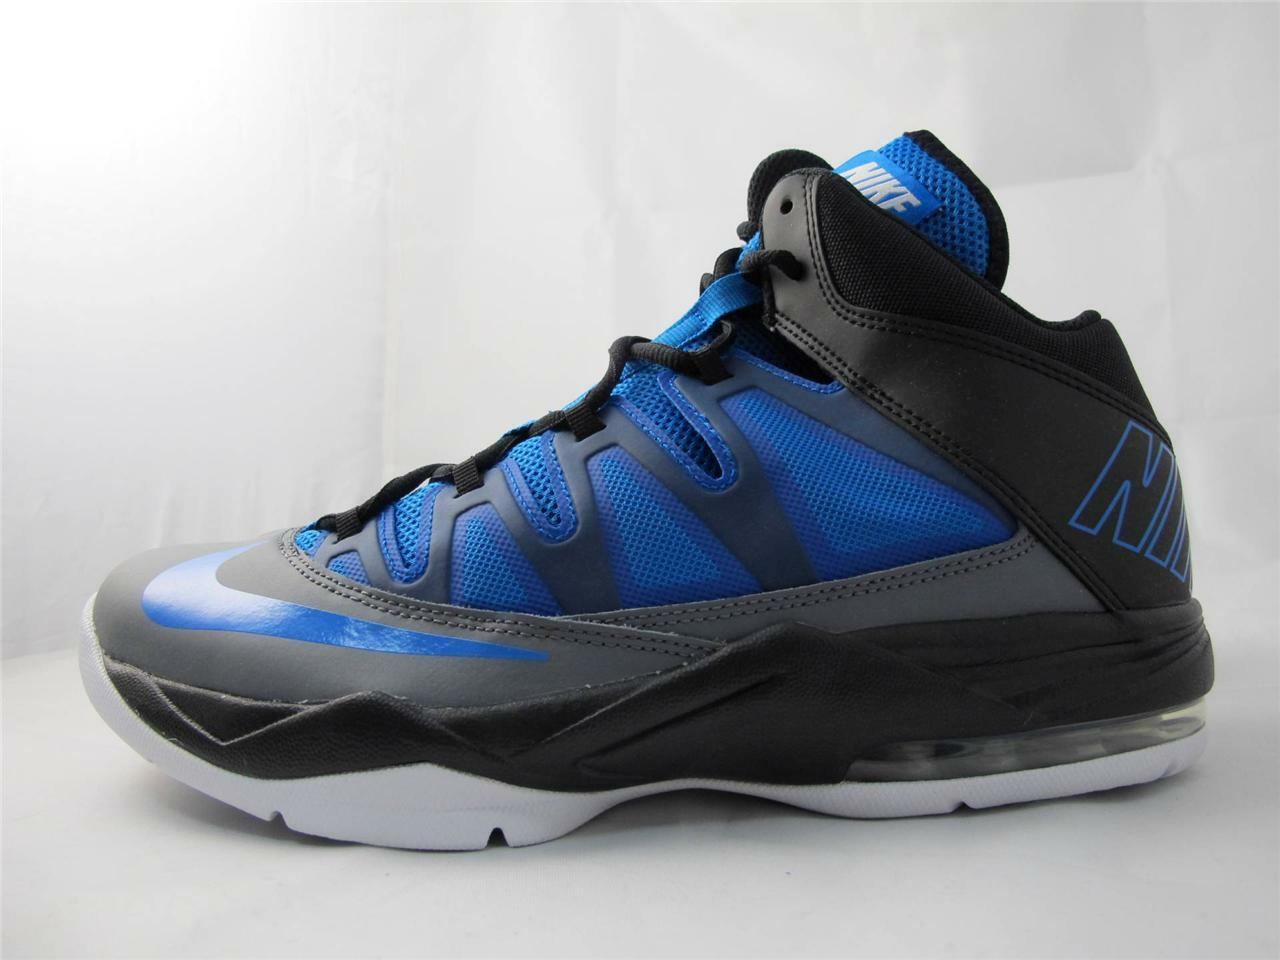 New Uomo Nike Air Max Stutter Step Sneaker 599565-005